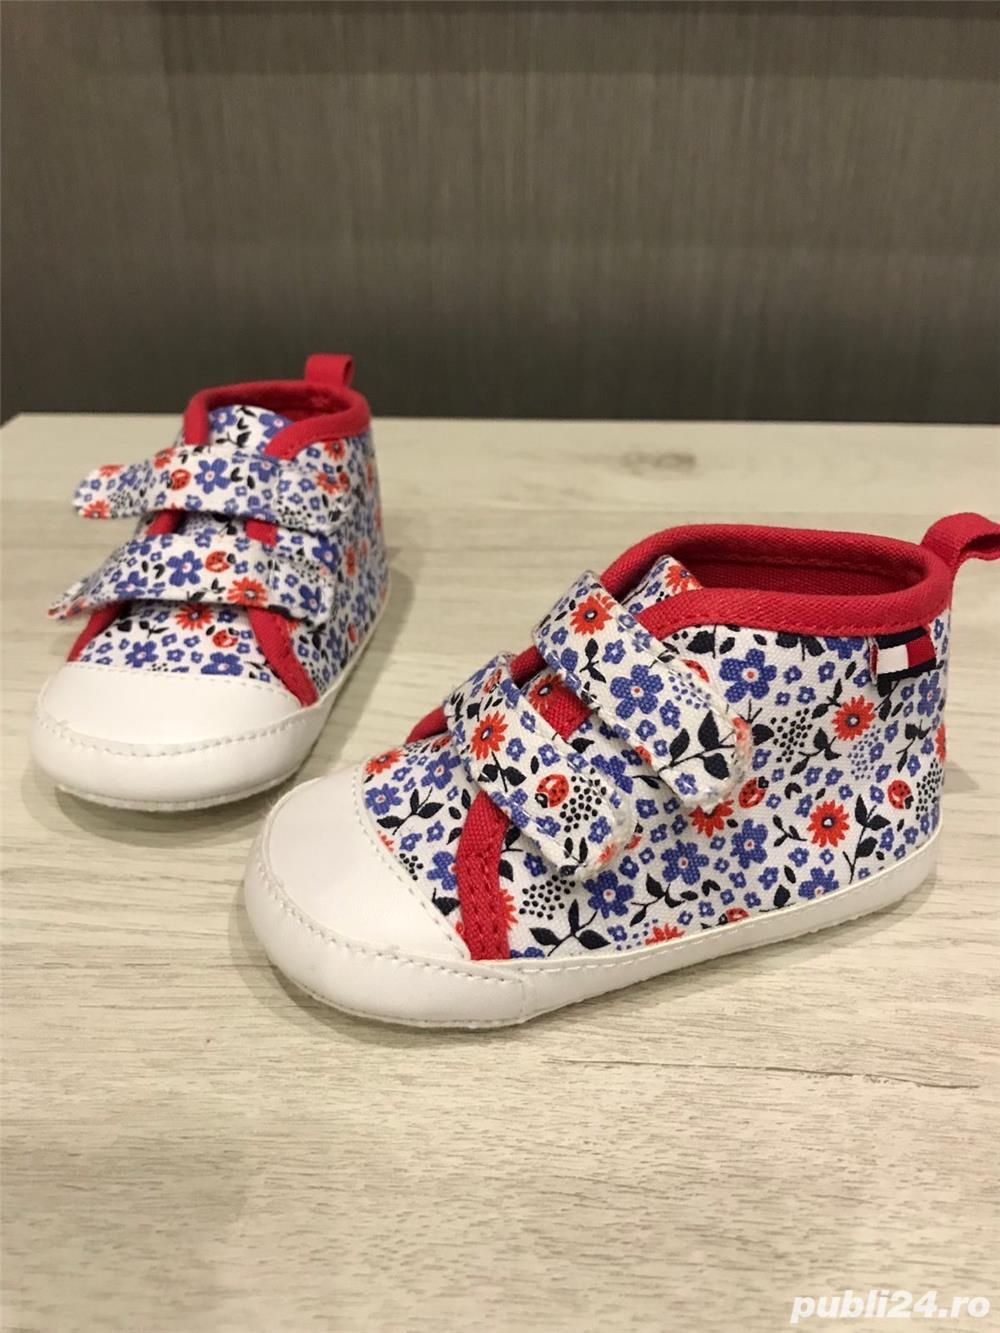 Vand pantofi NOI, CU ETICHETA; ORIGINALI pentru BEBE - marime US3-4, EUR18.5-19.5 - Tommy Hilfiger